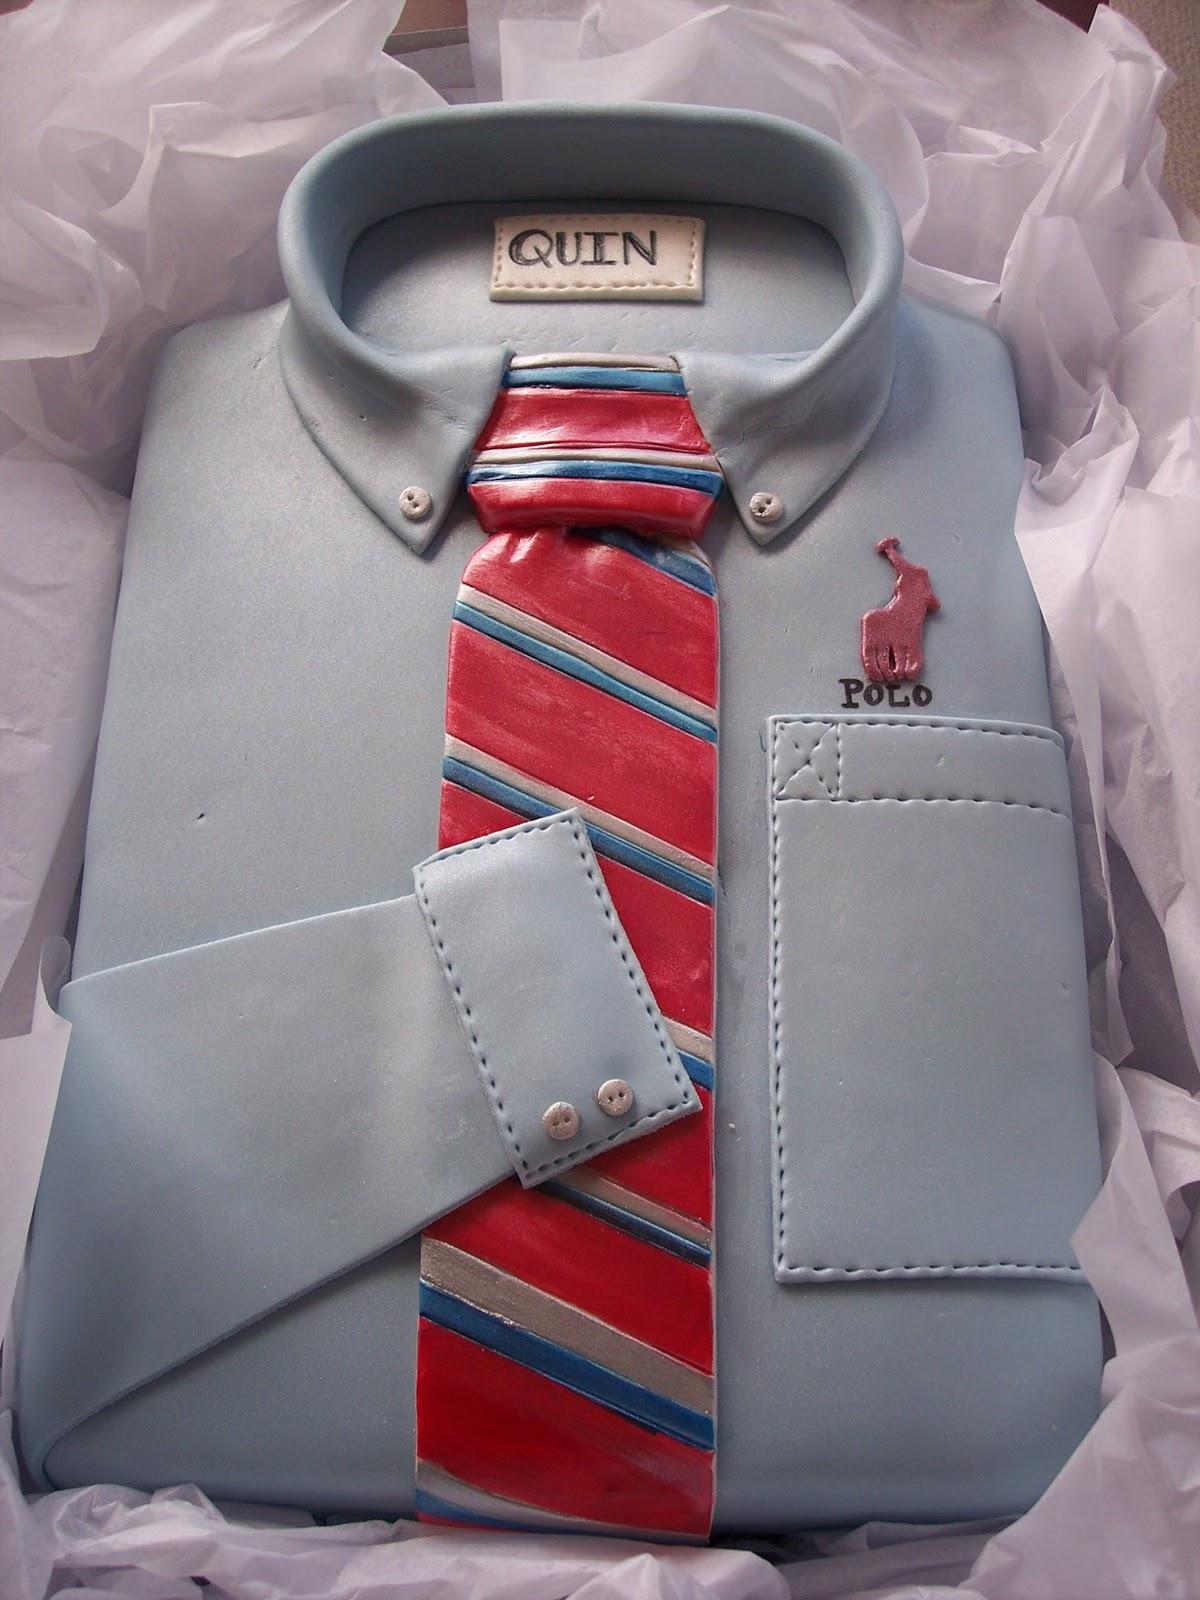 Mymonicakes Polo Shirt And Tie Cake